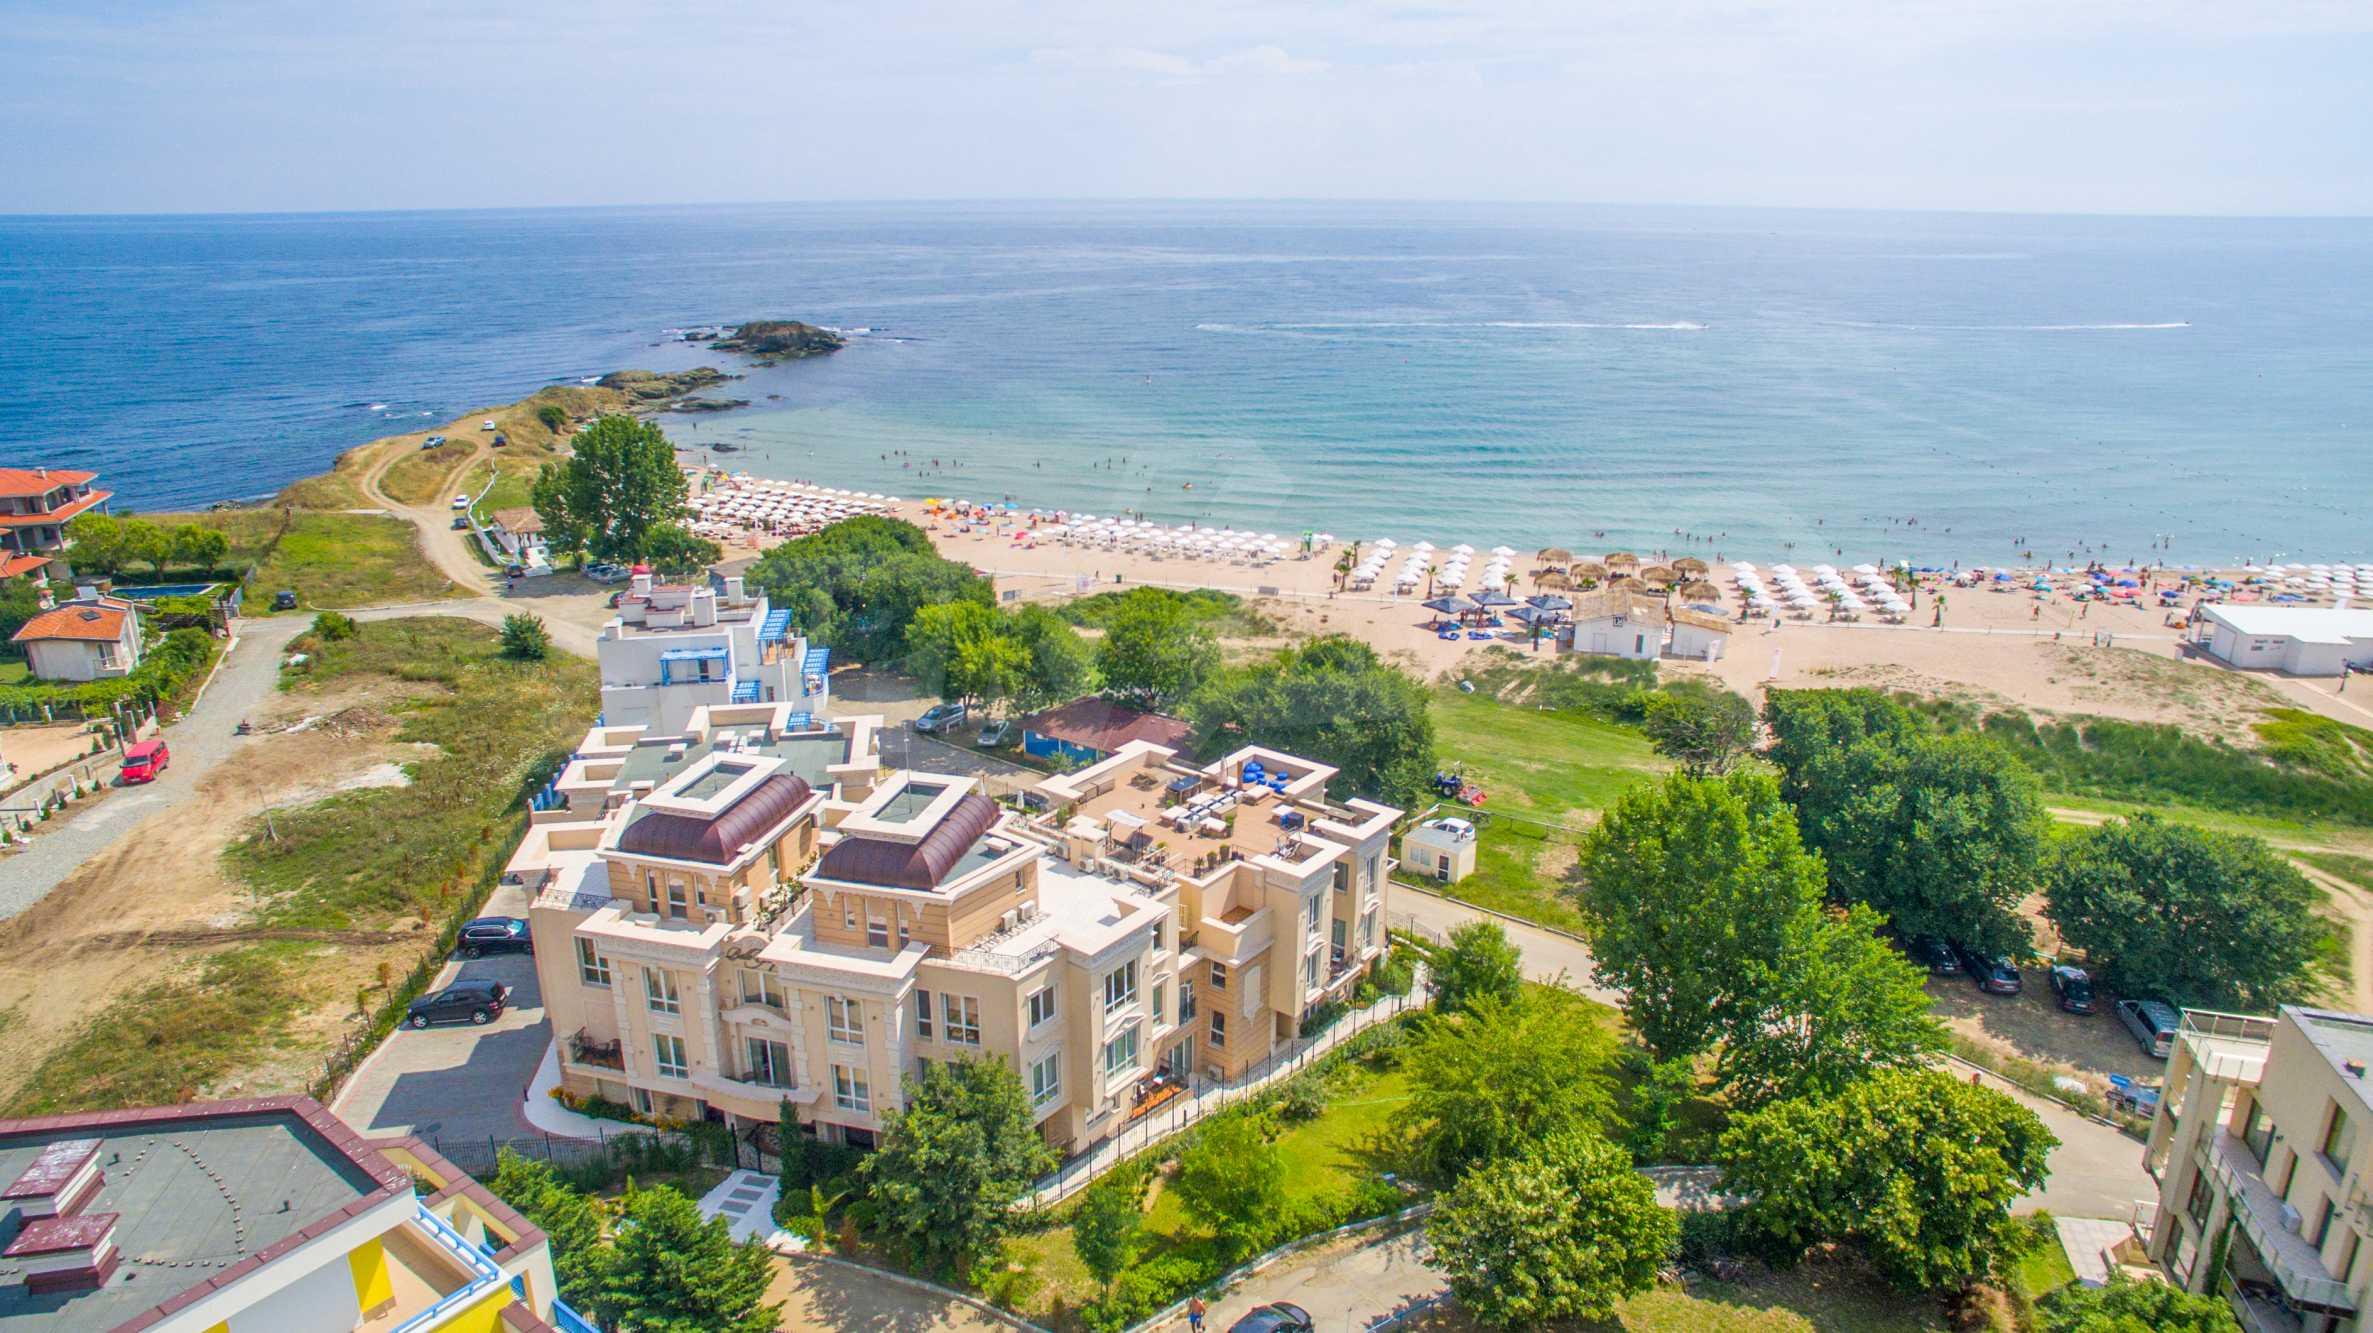 Exclusive 2-bedroom beachfront apartment in the prestigious Belle Époque Beach Residence 47